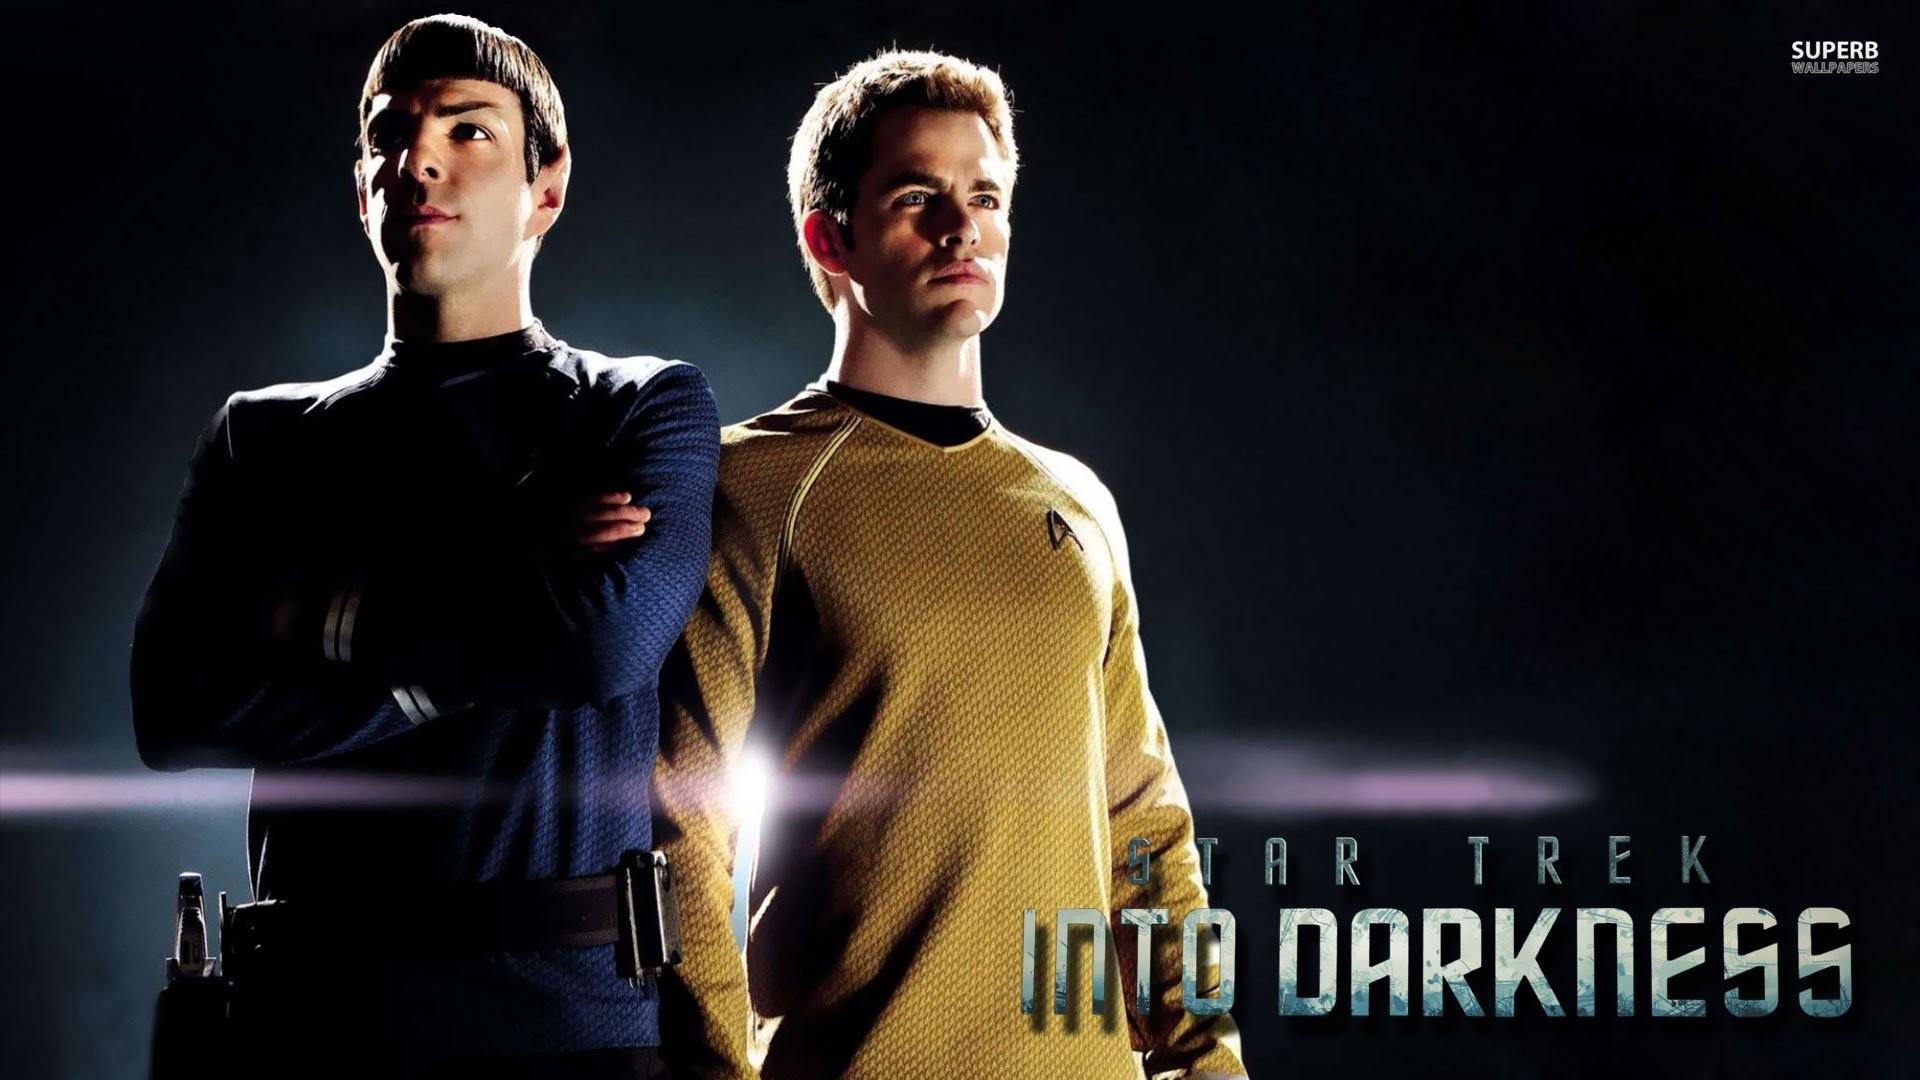 Spock in Star Trek wallpapers (67 Wallpapers)